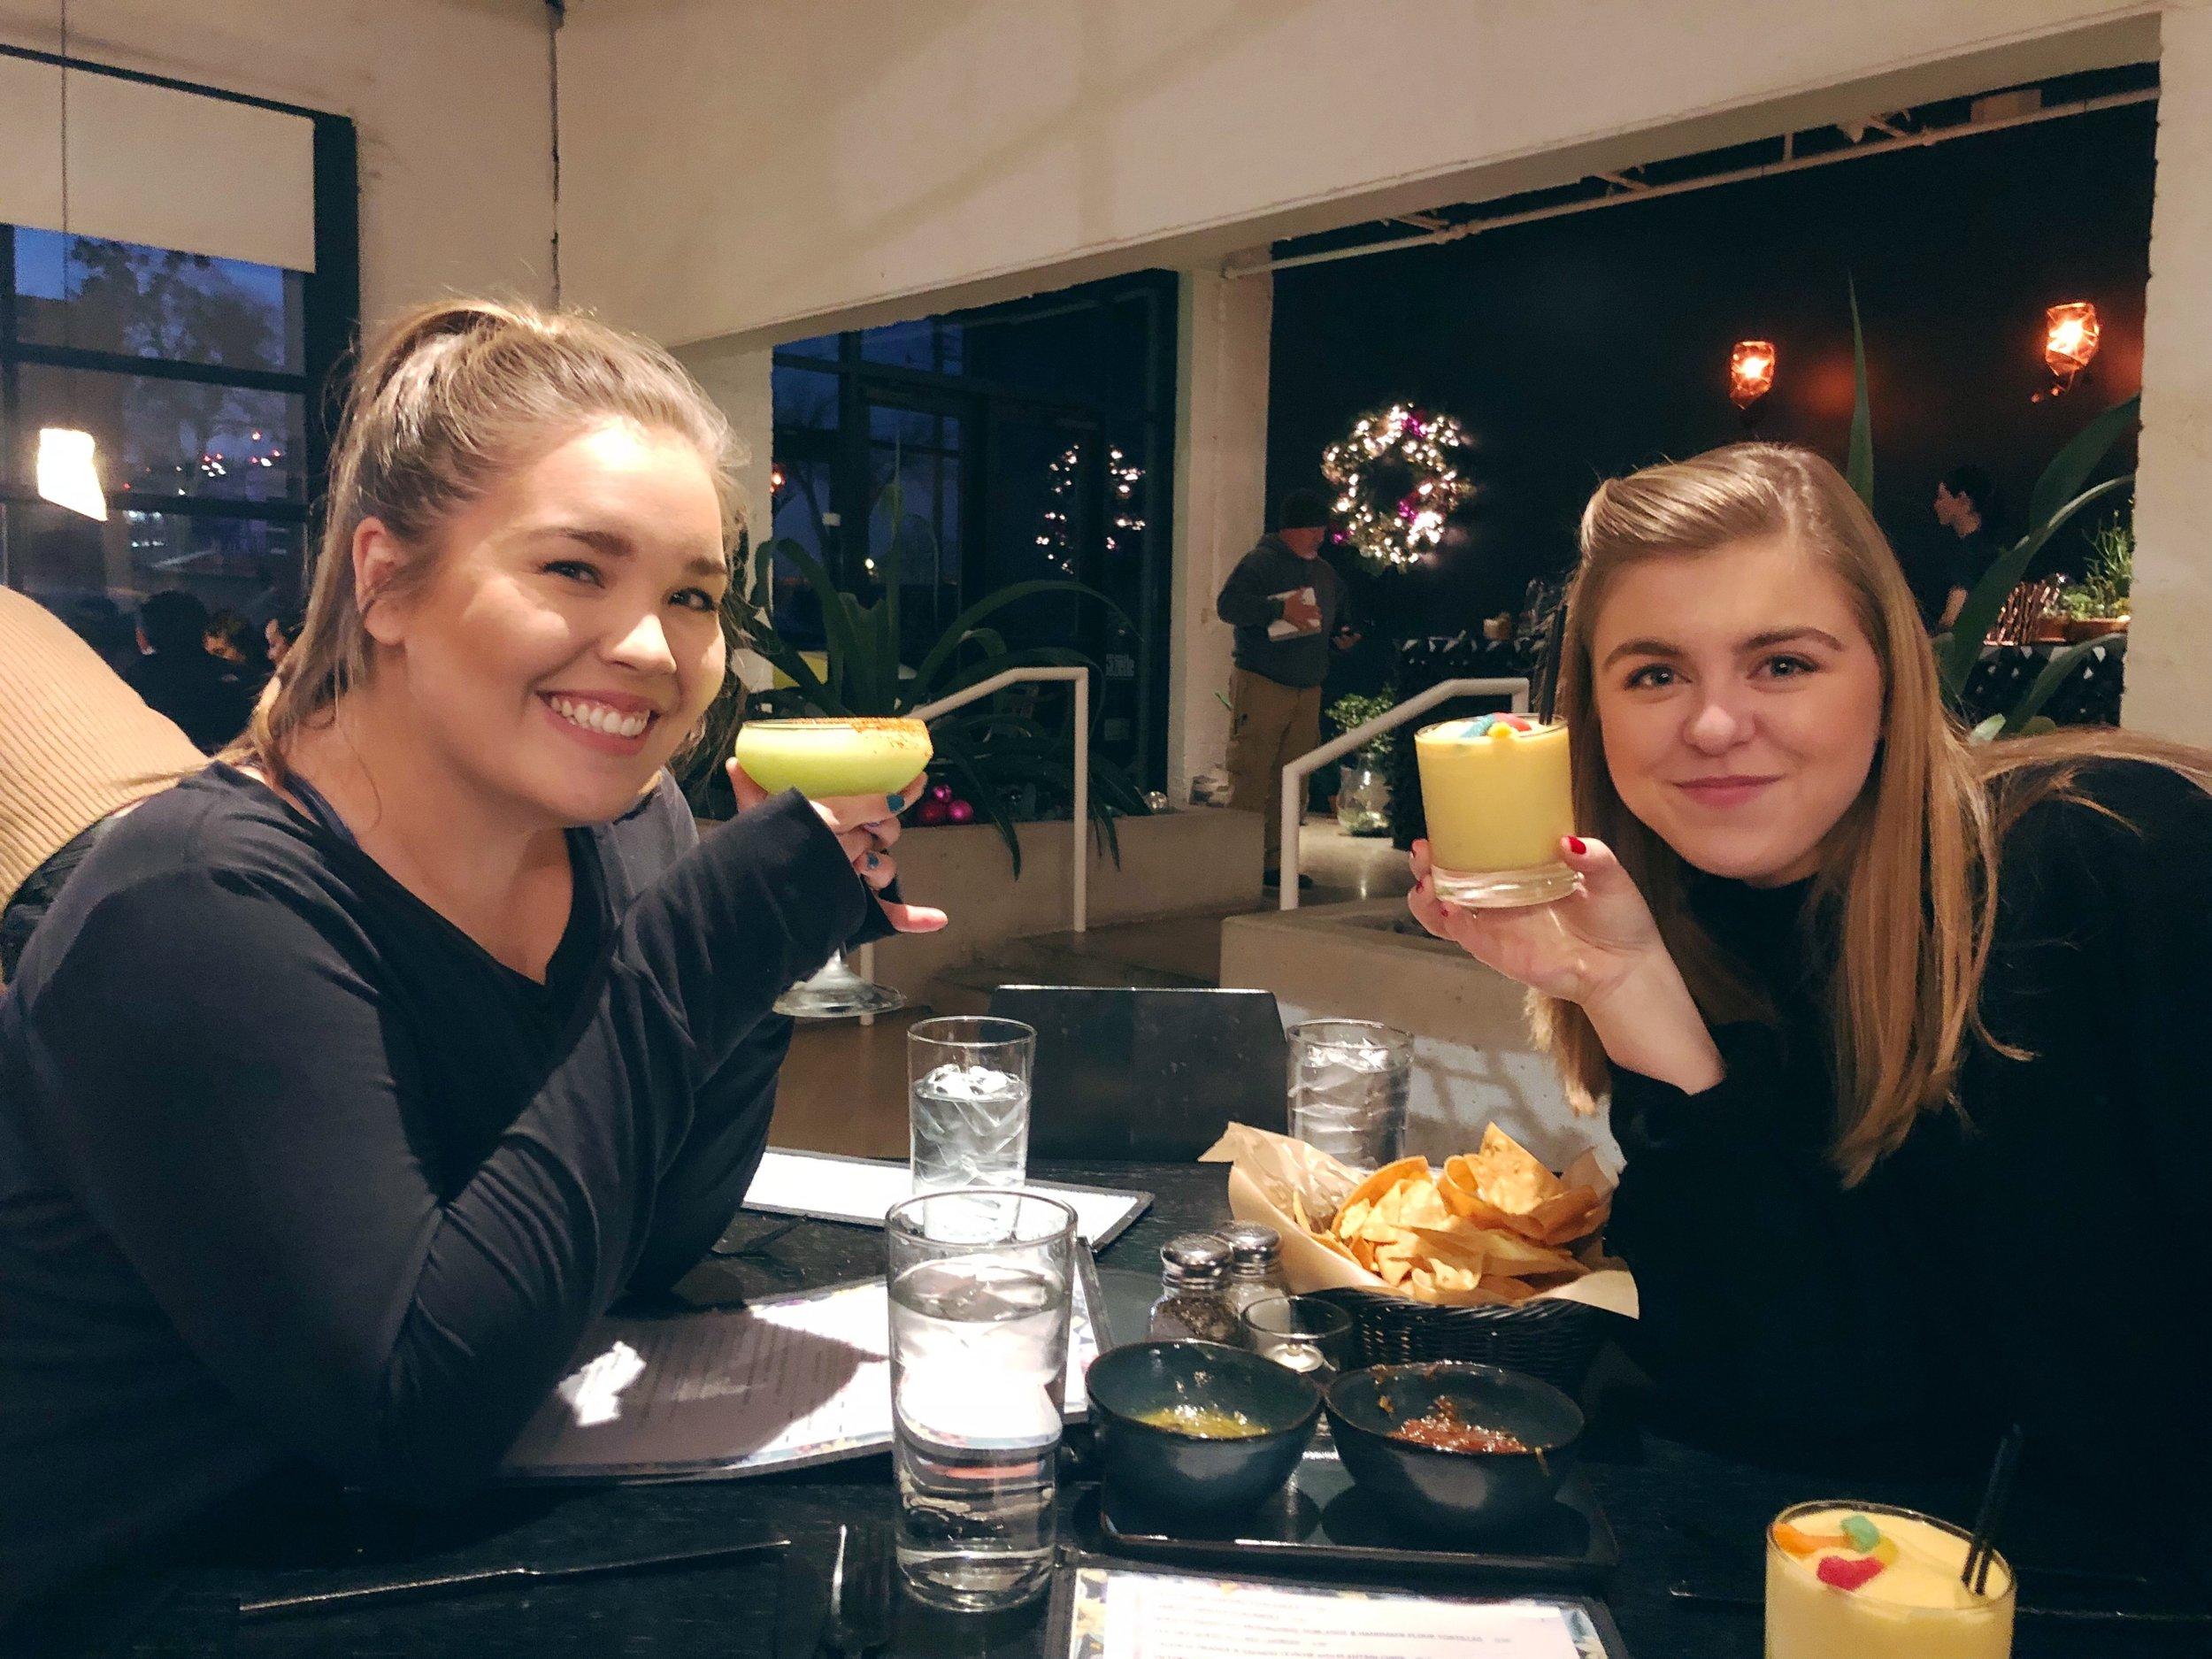 Best girls, best food, best drinks, best city.